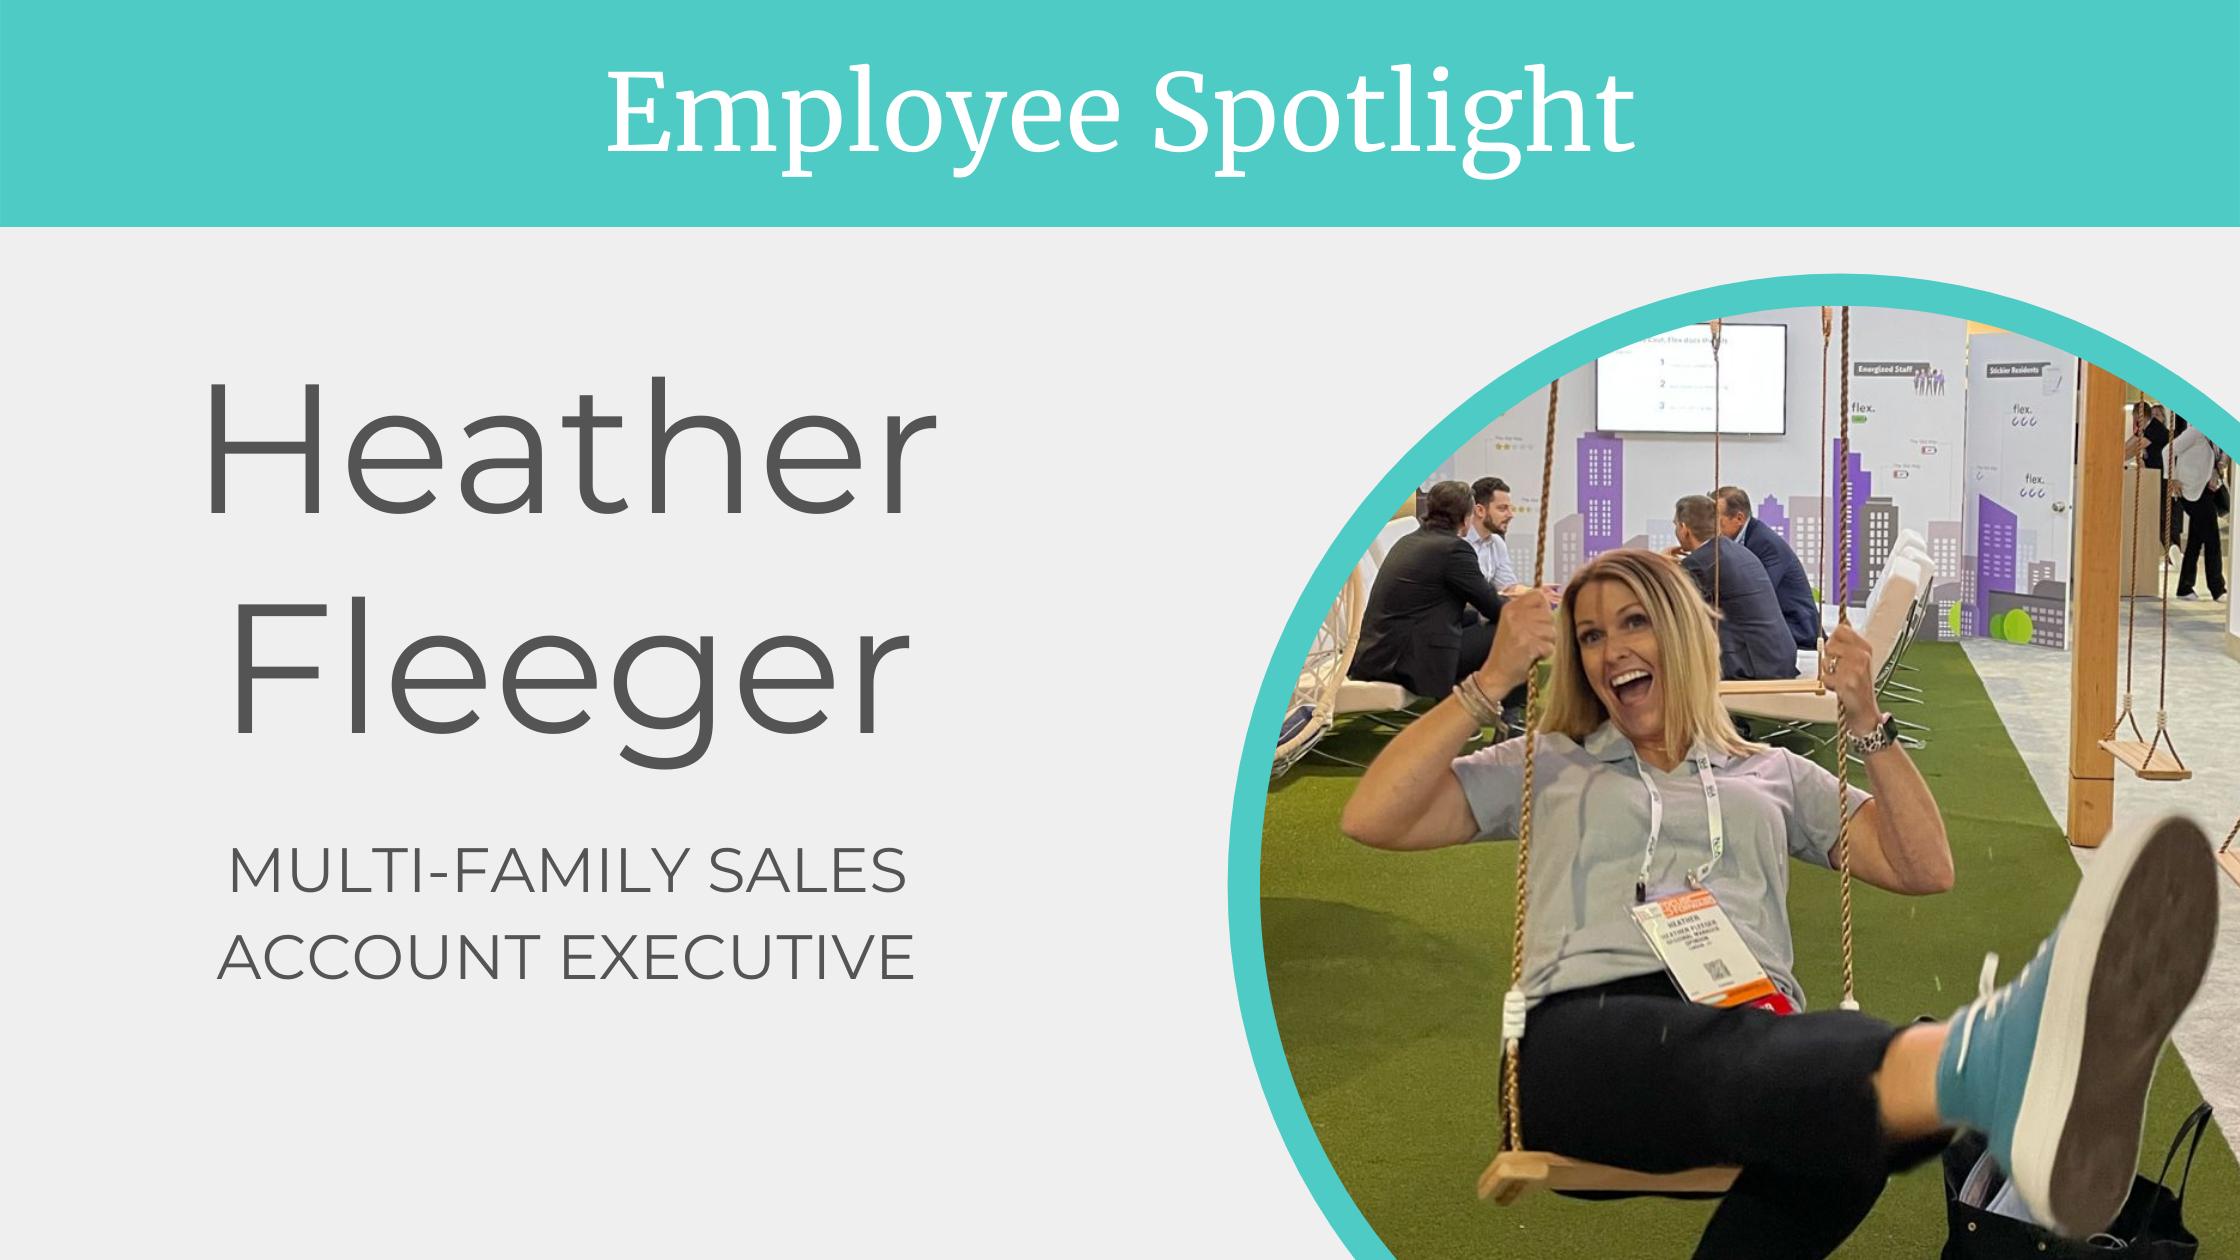 Heather Fleeger Employee Spotlight